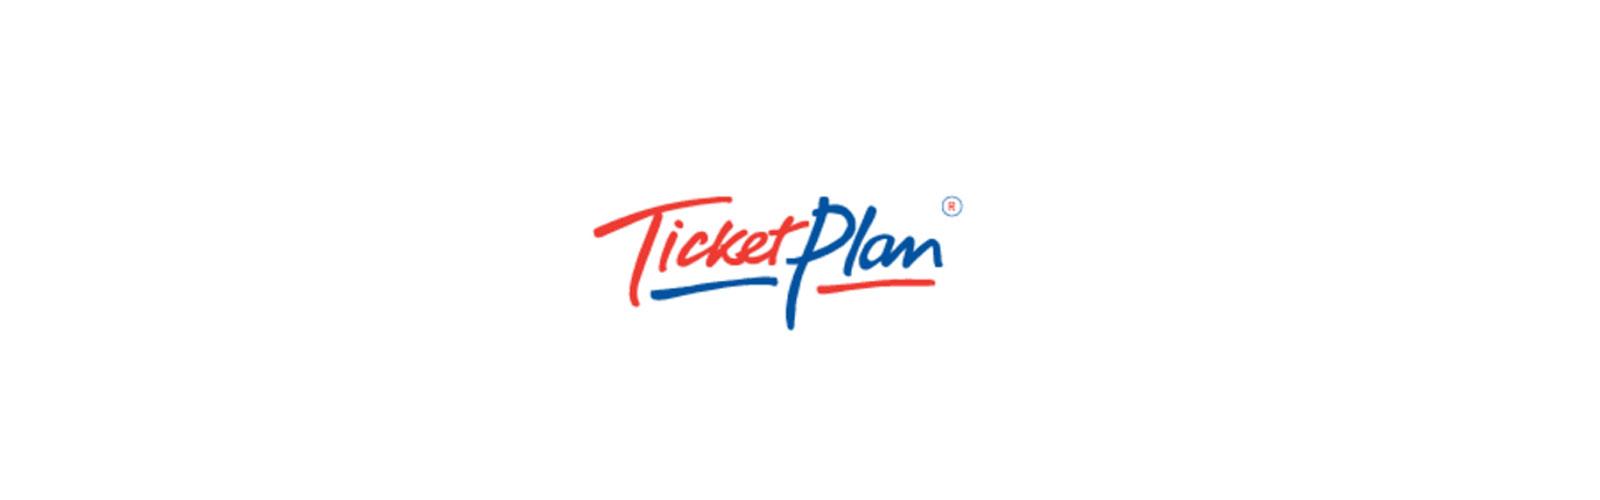 ticketplan